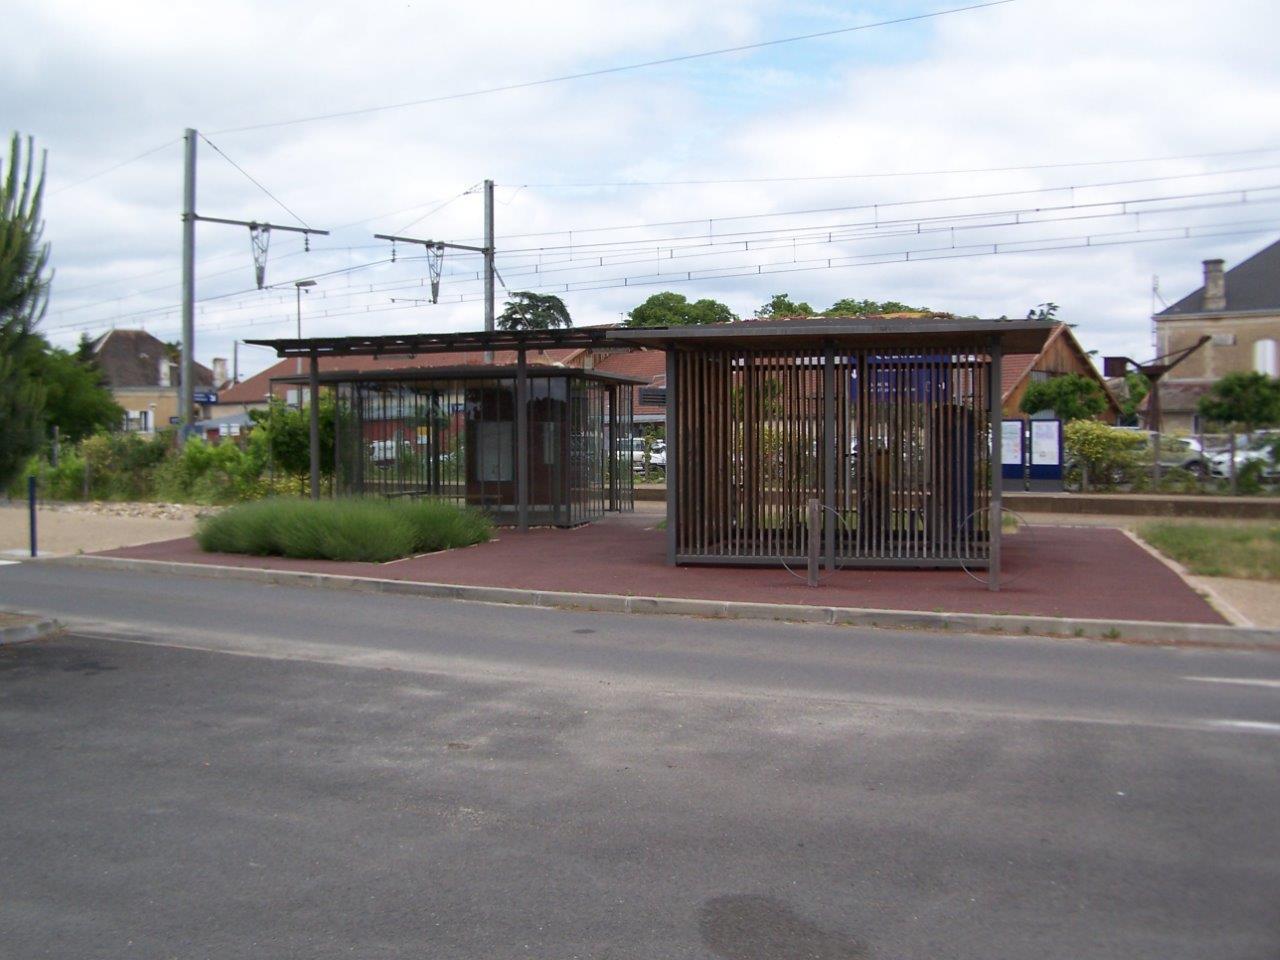 gare-de-portets-train-station